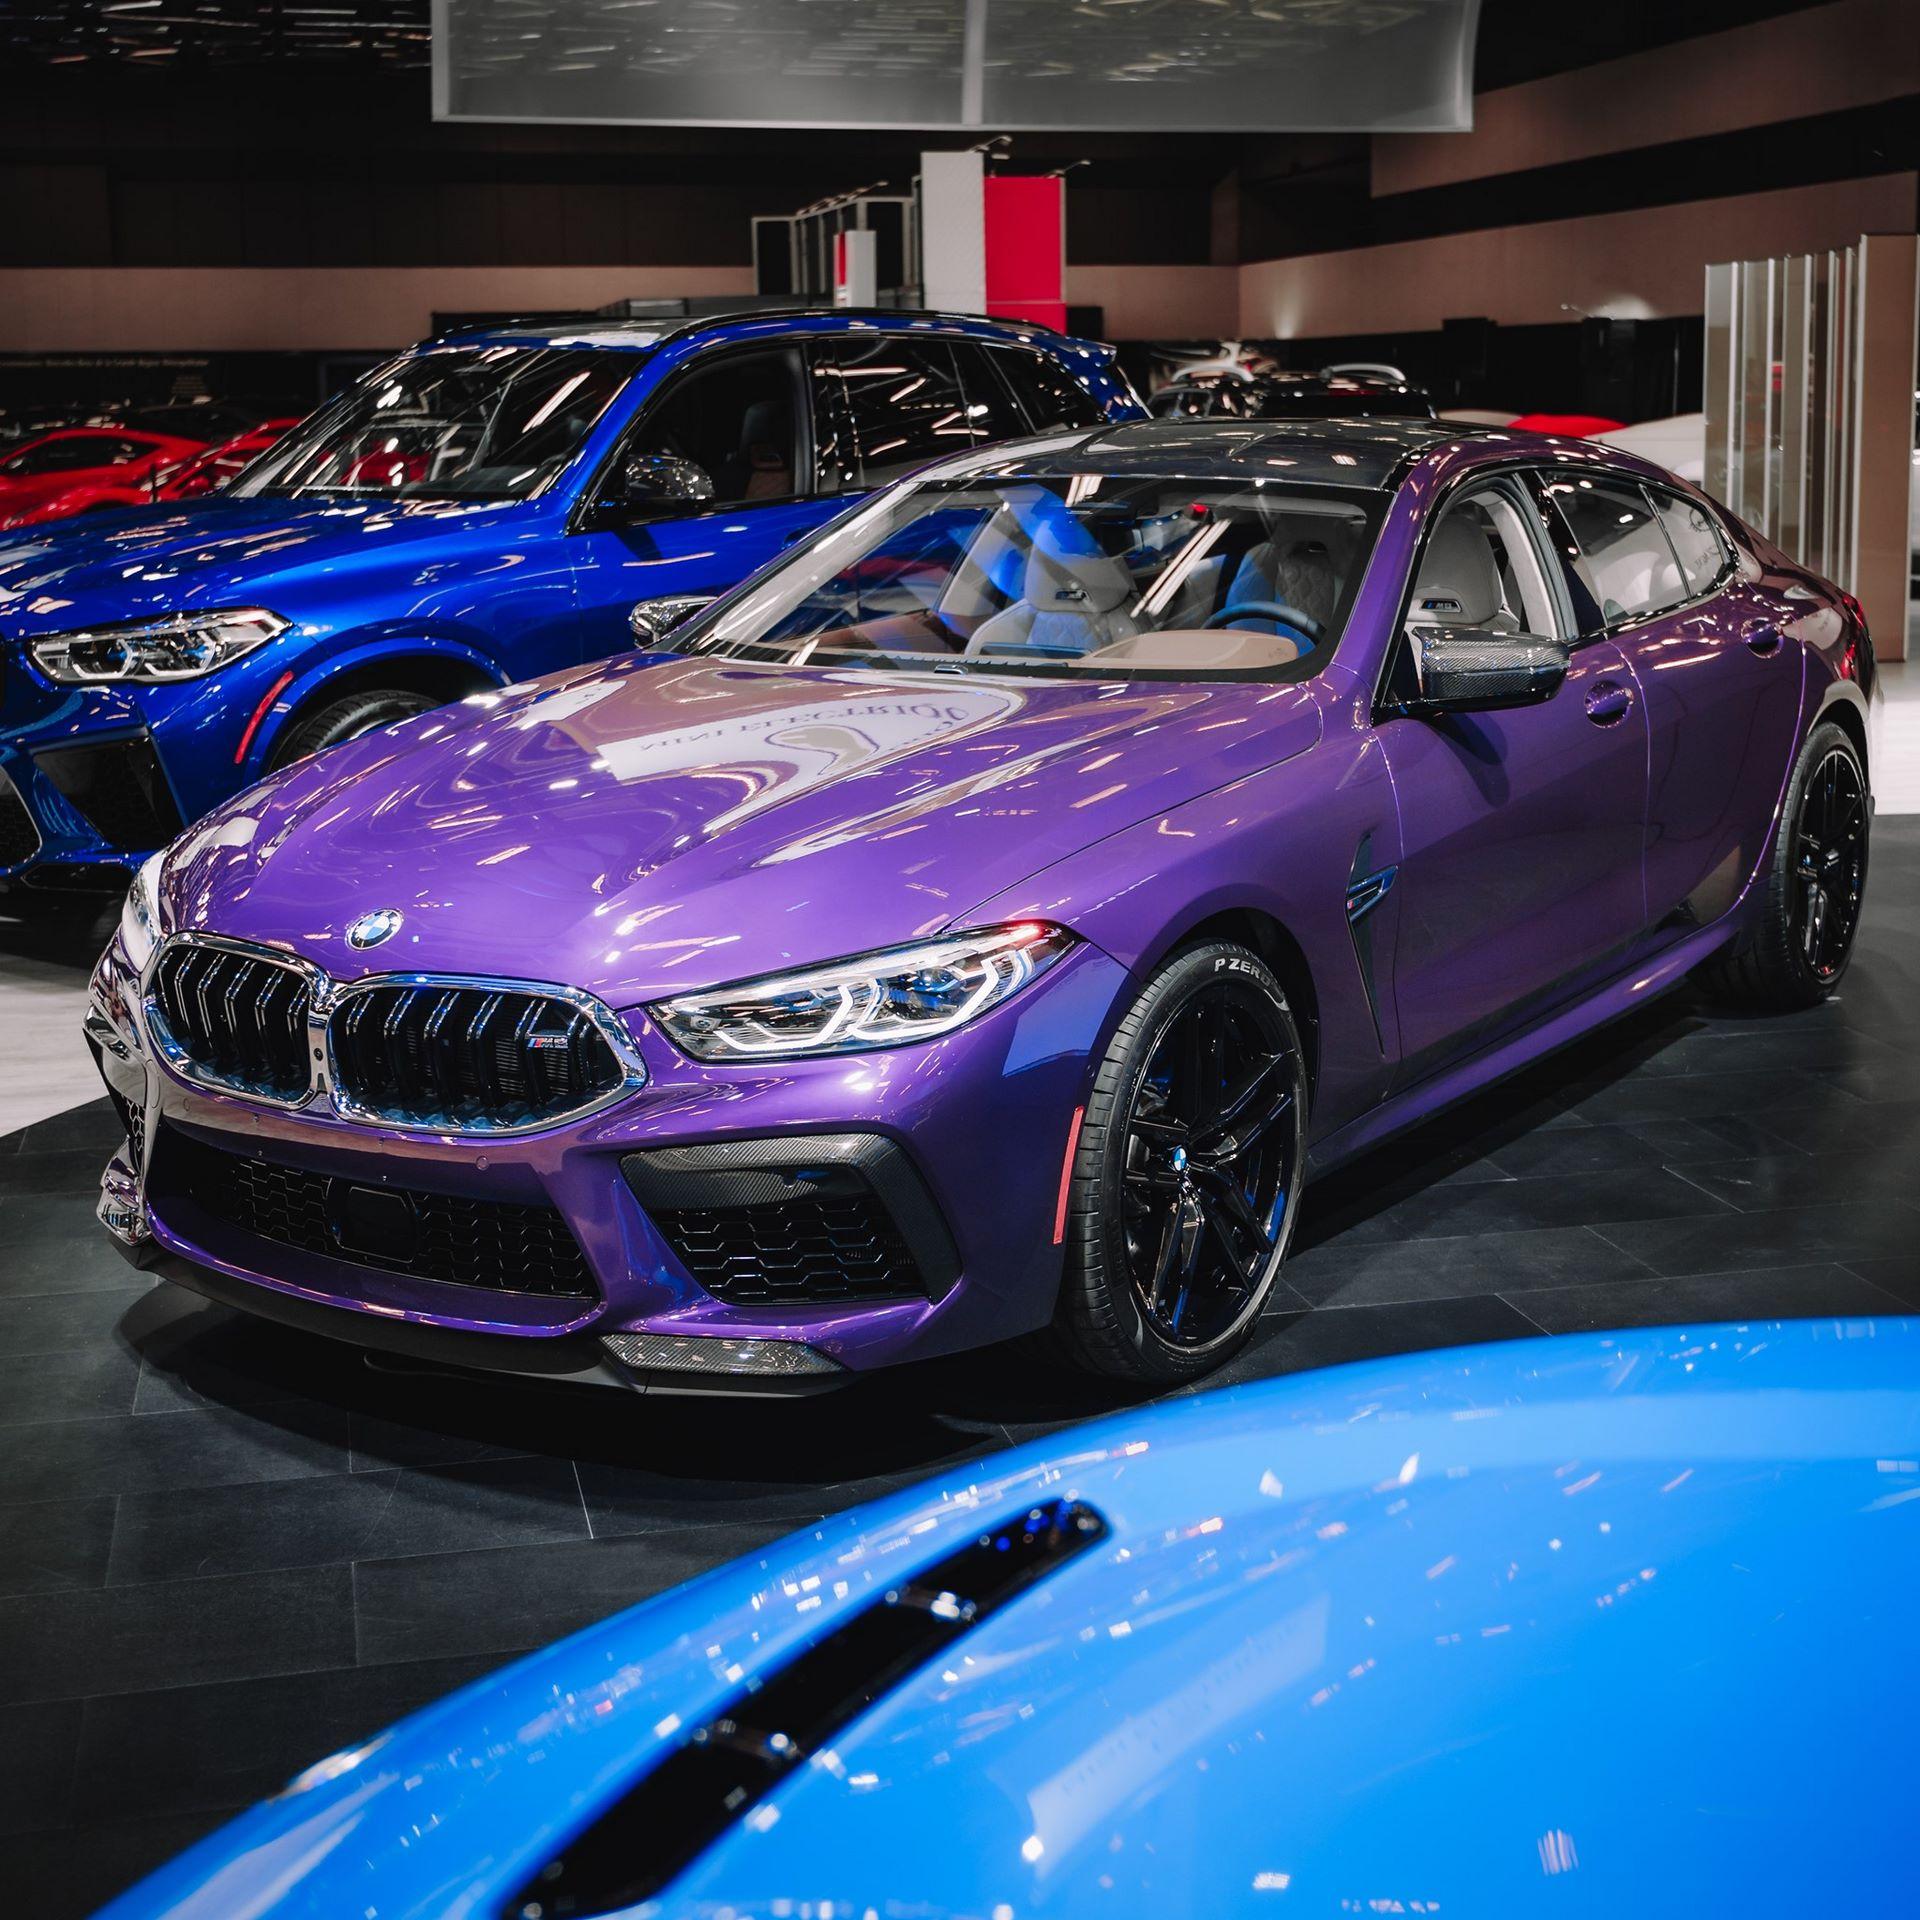 BMW-M8-Gran-Coupe-Twilight-Purple-1